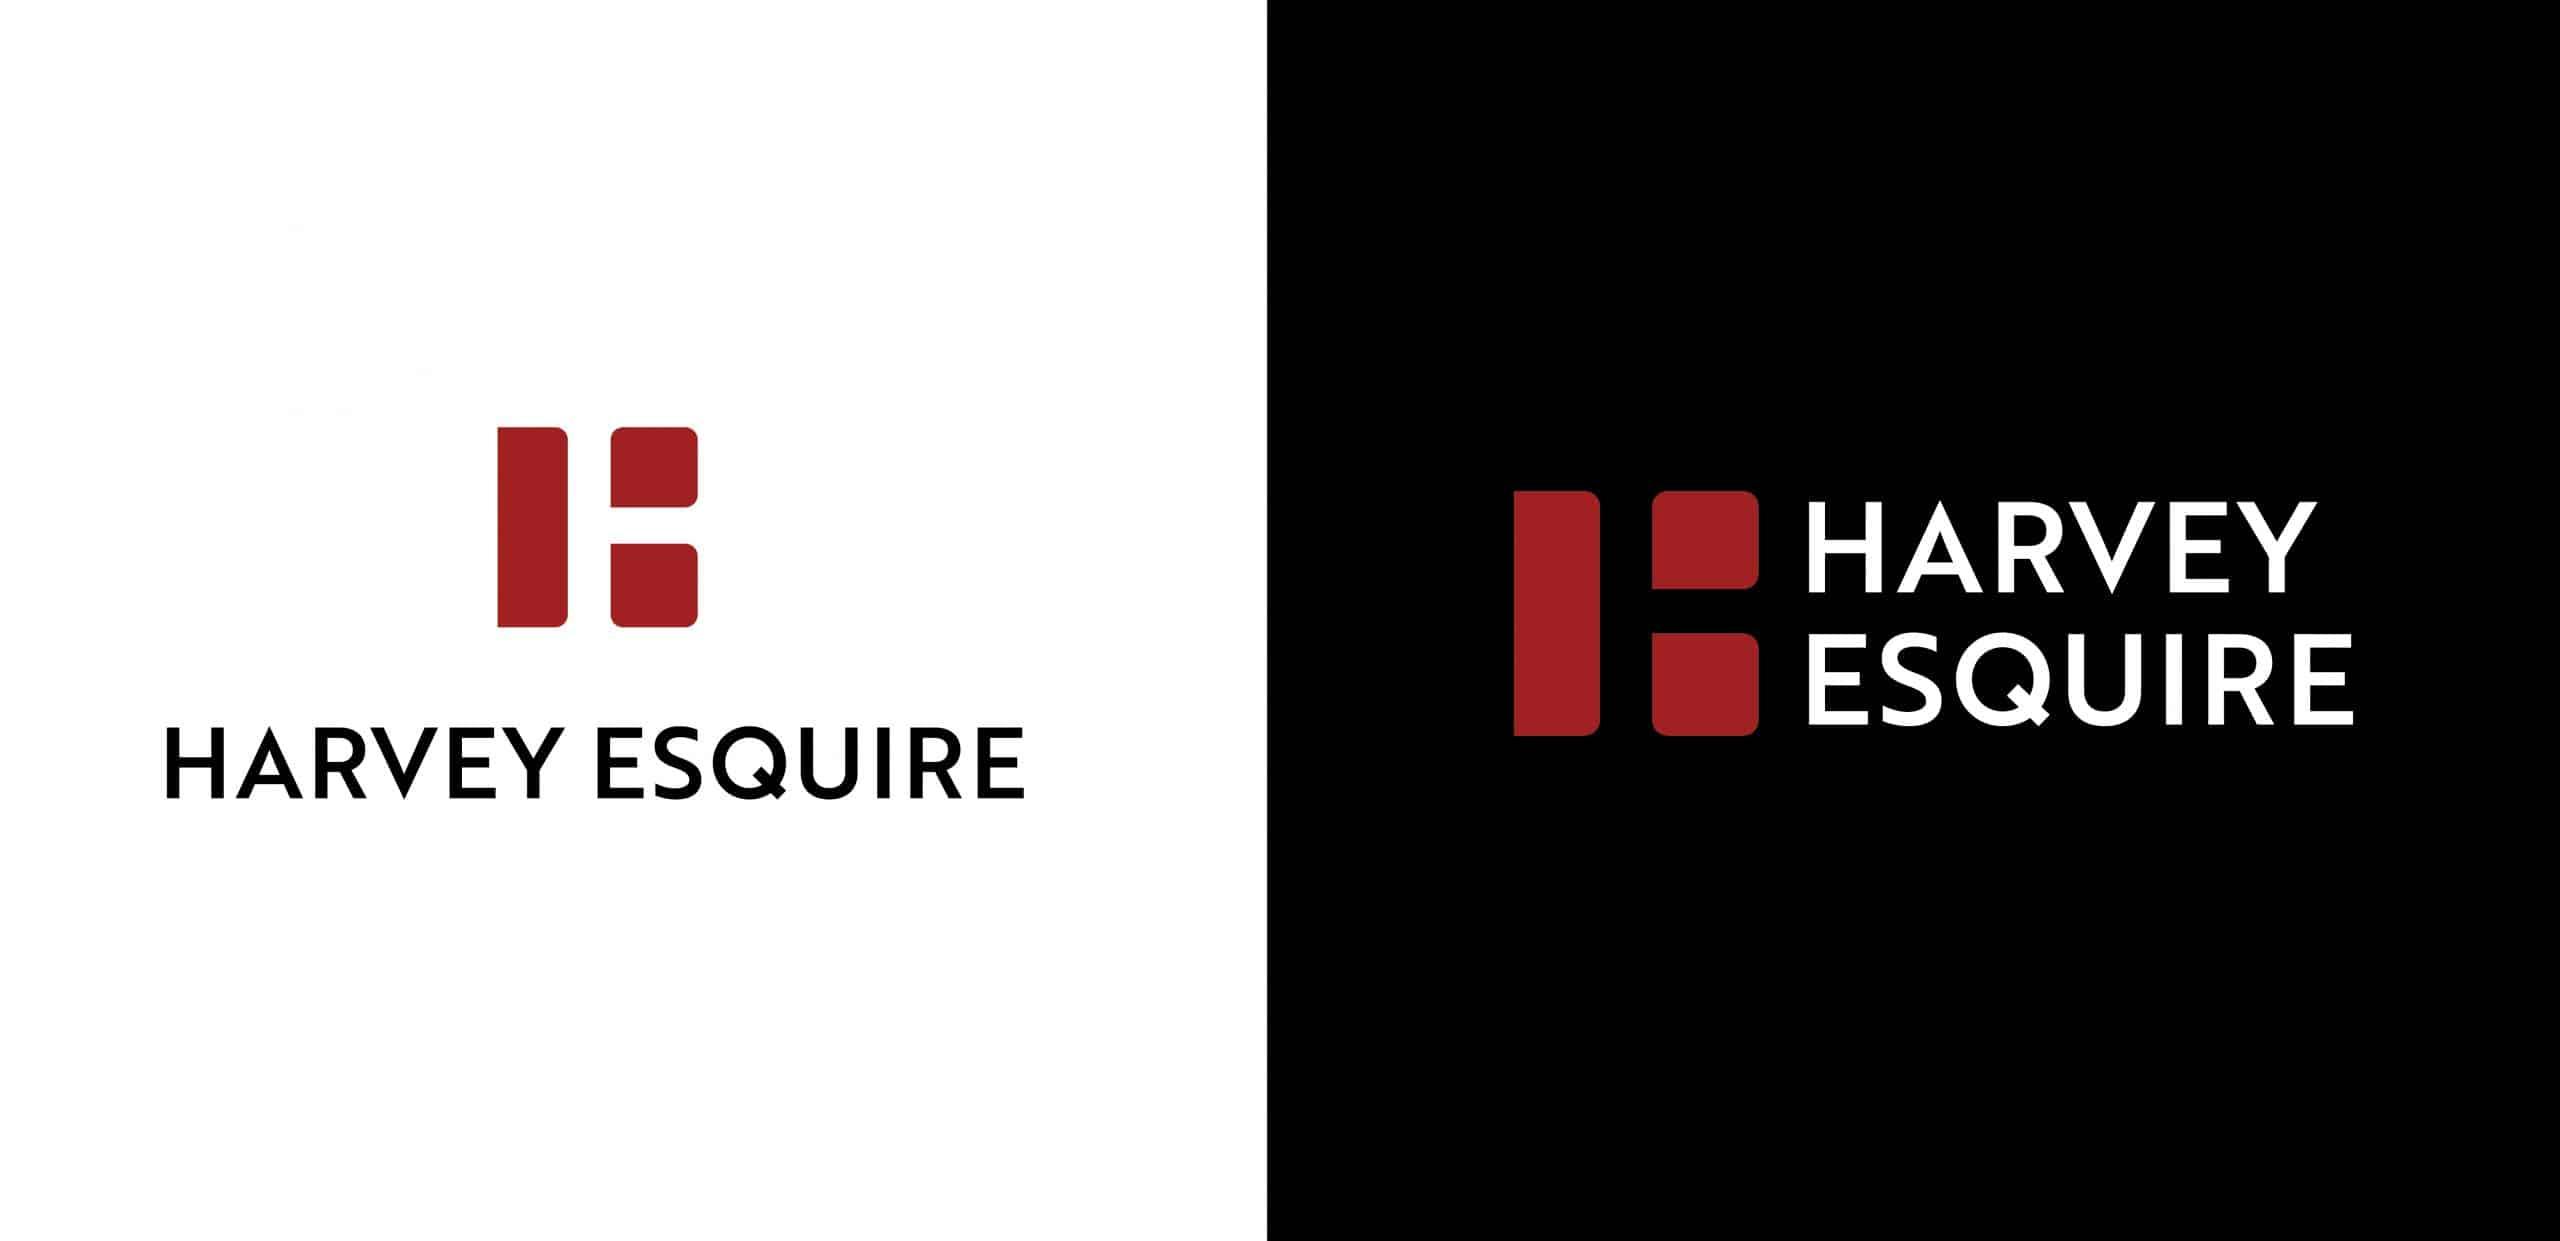 Stellen_Design_Harvey_esquire_Branding-03